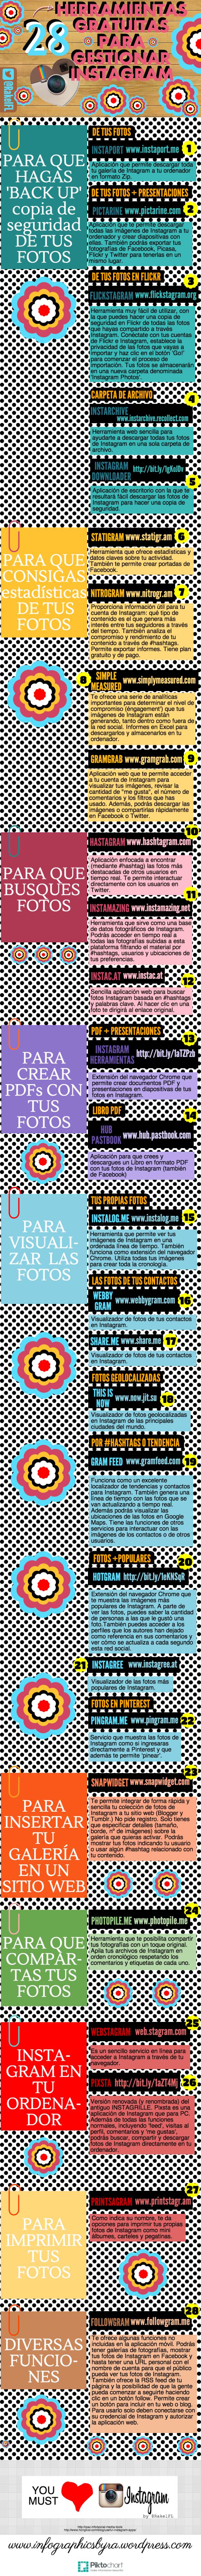 29-herramientas-gratuitas-para-gestionar-instagram-infographic (1)